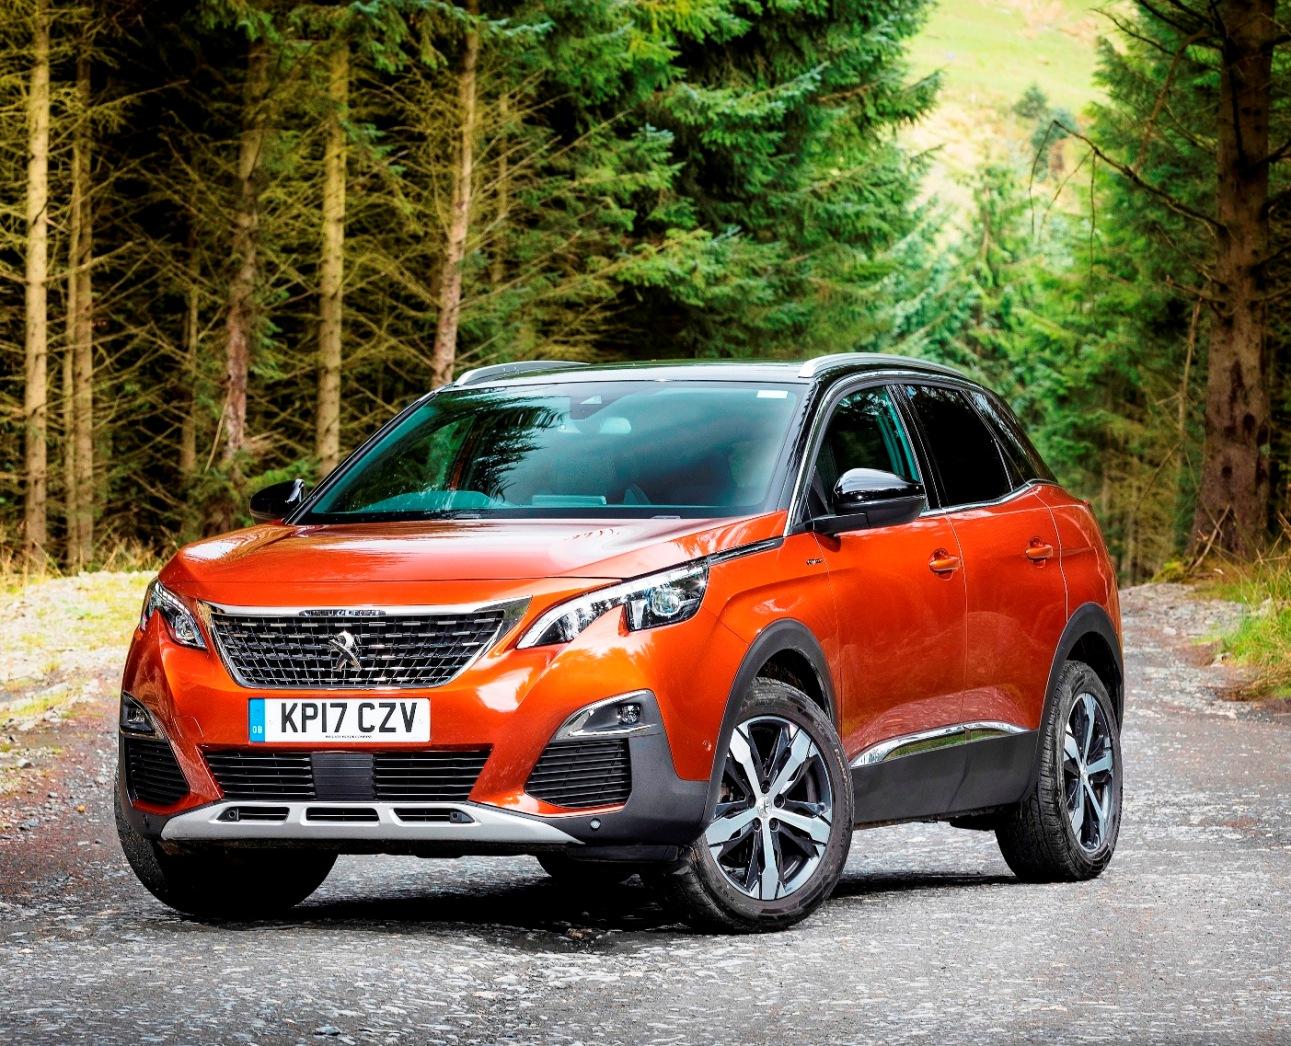 Sunday Drive: Peugeot 3008 2.0-Litre Diesel 8-speed